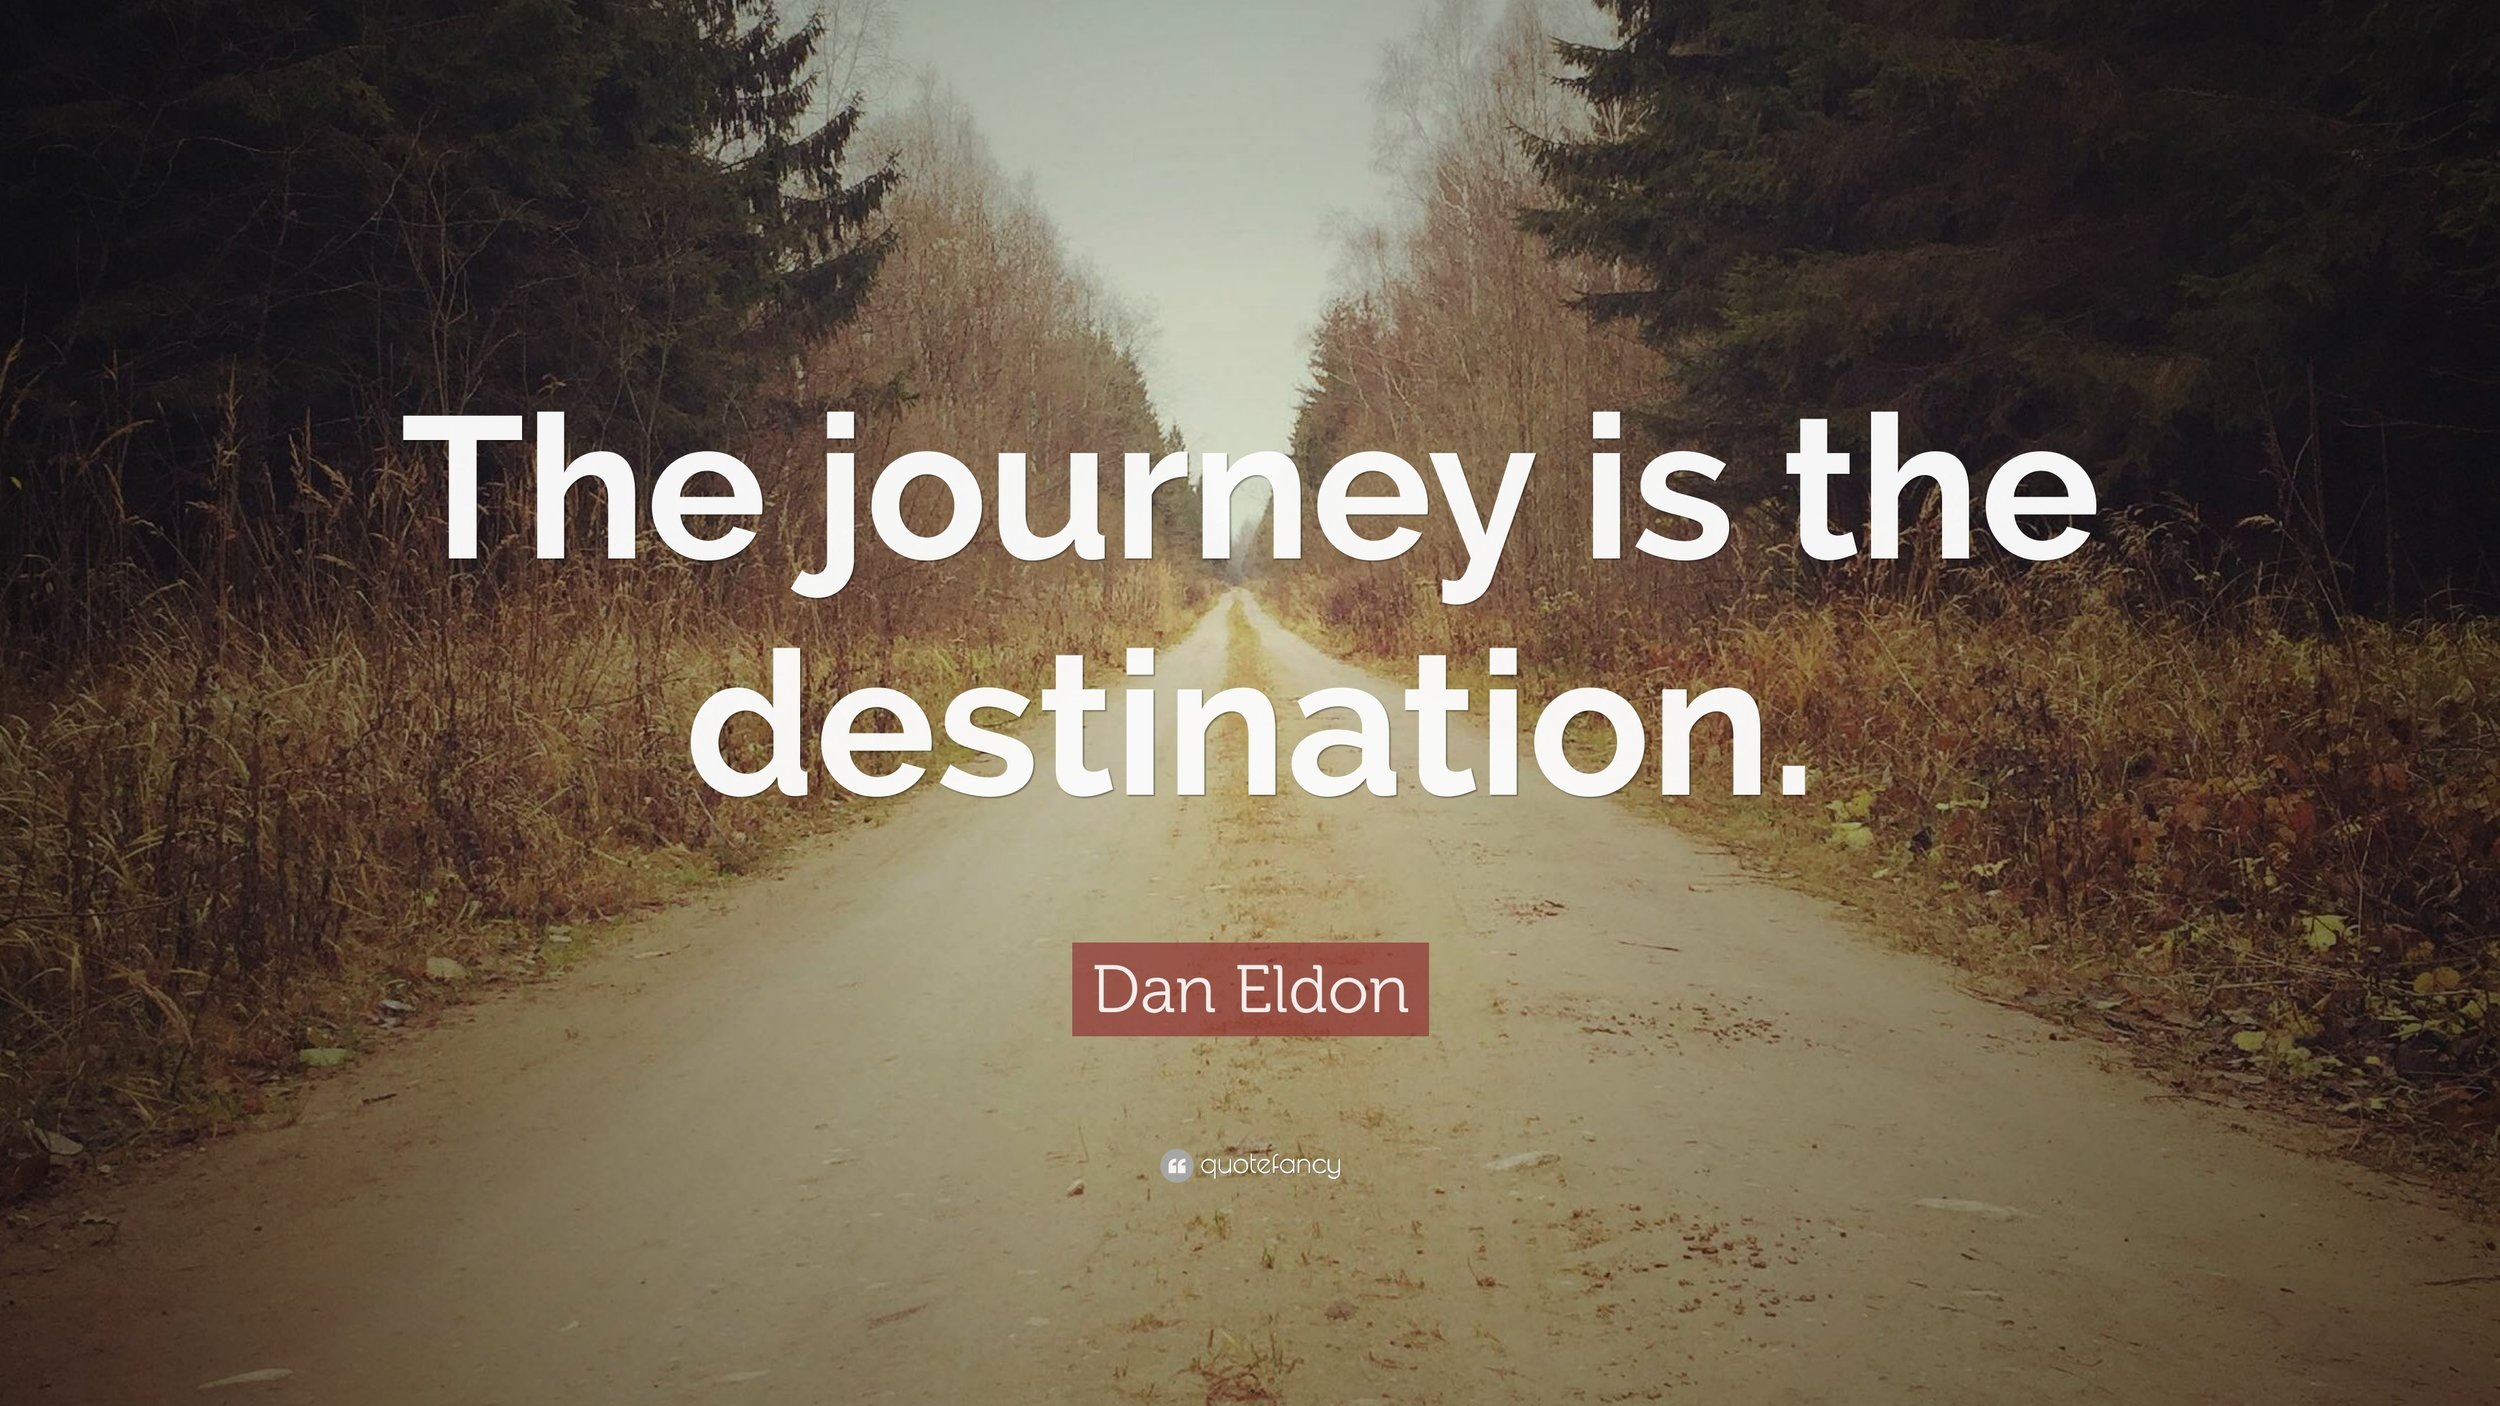 1598708-Dan-Eldon-Quote-The-journey-is-the-destination.jpg